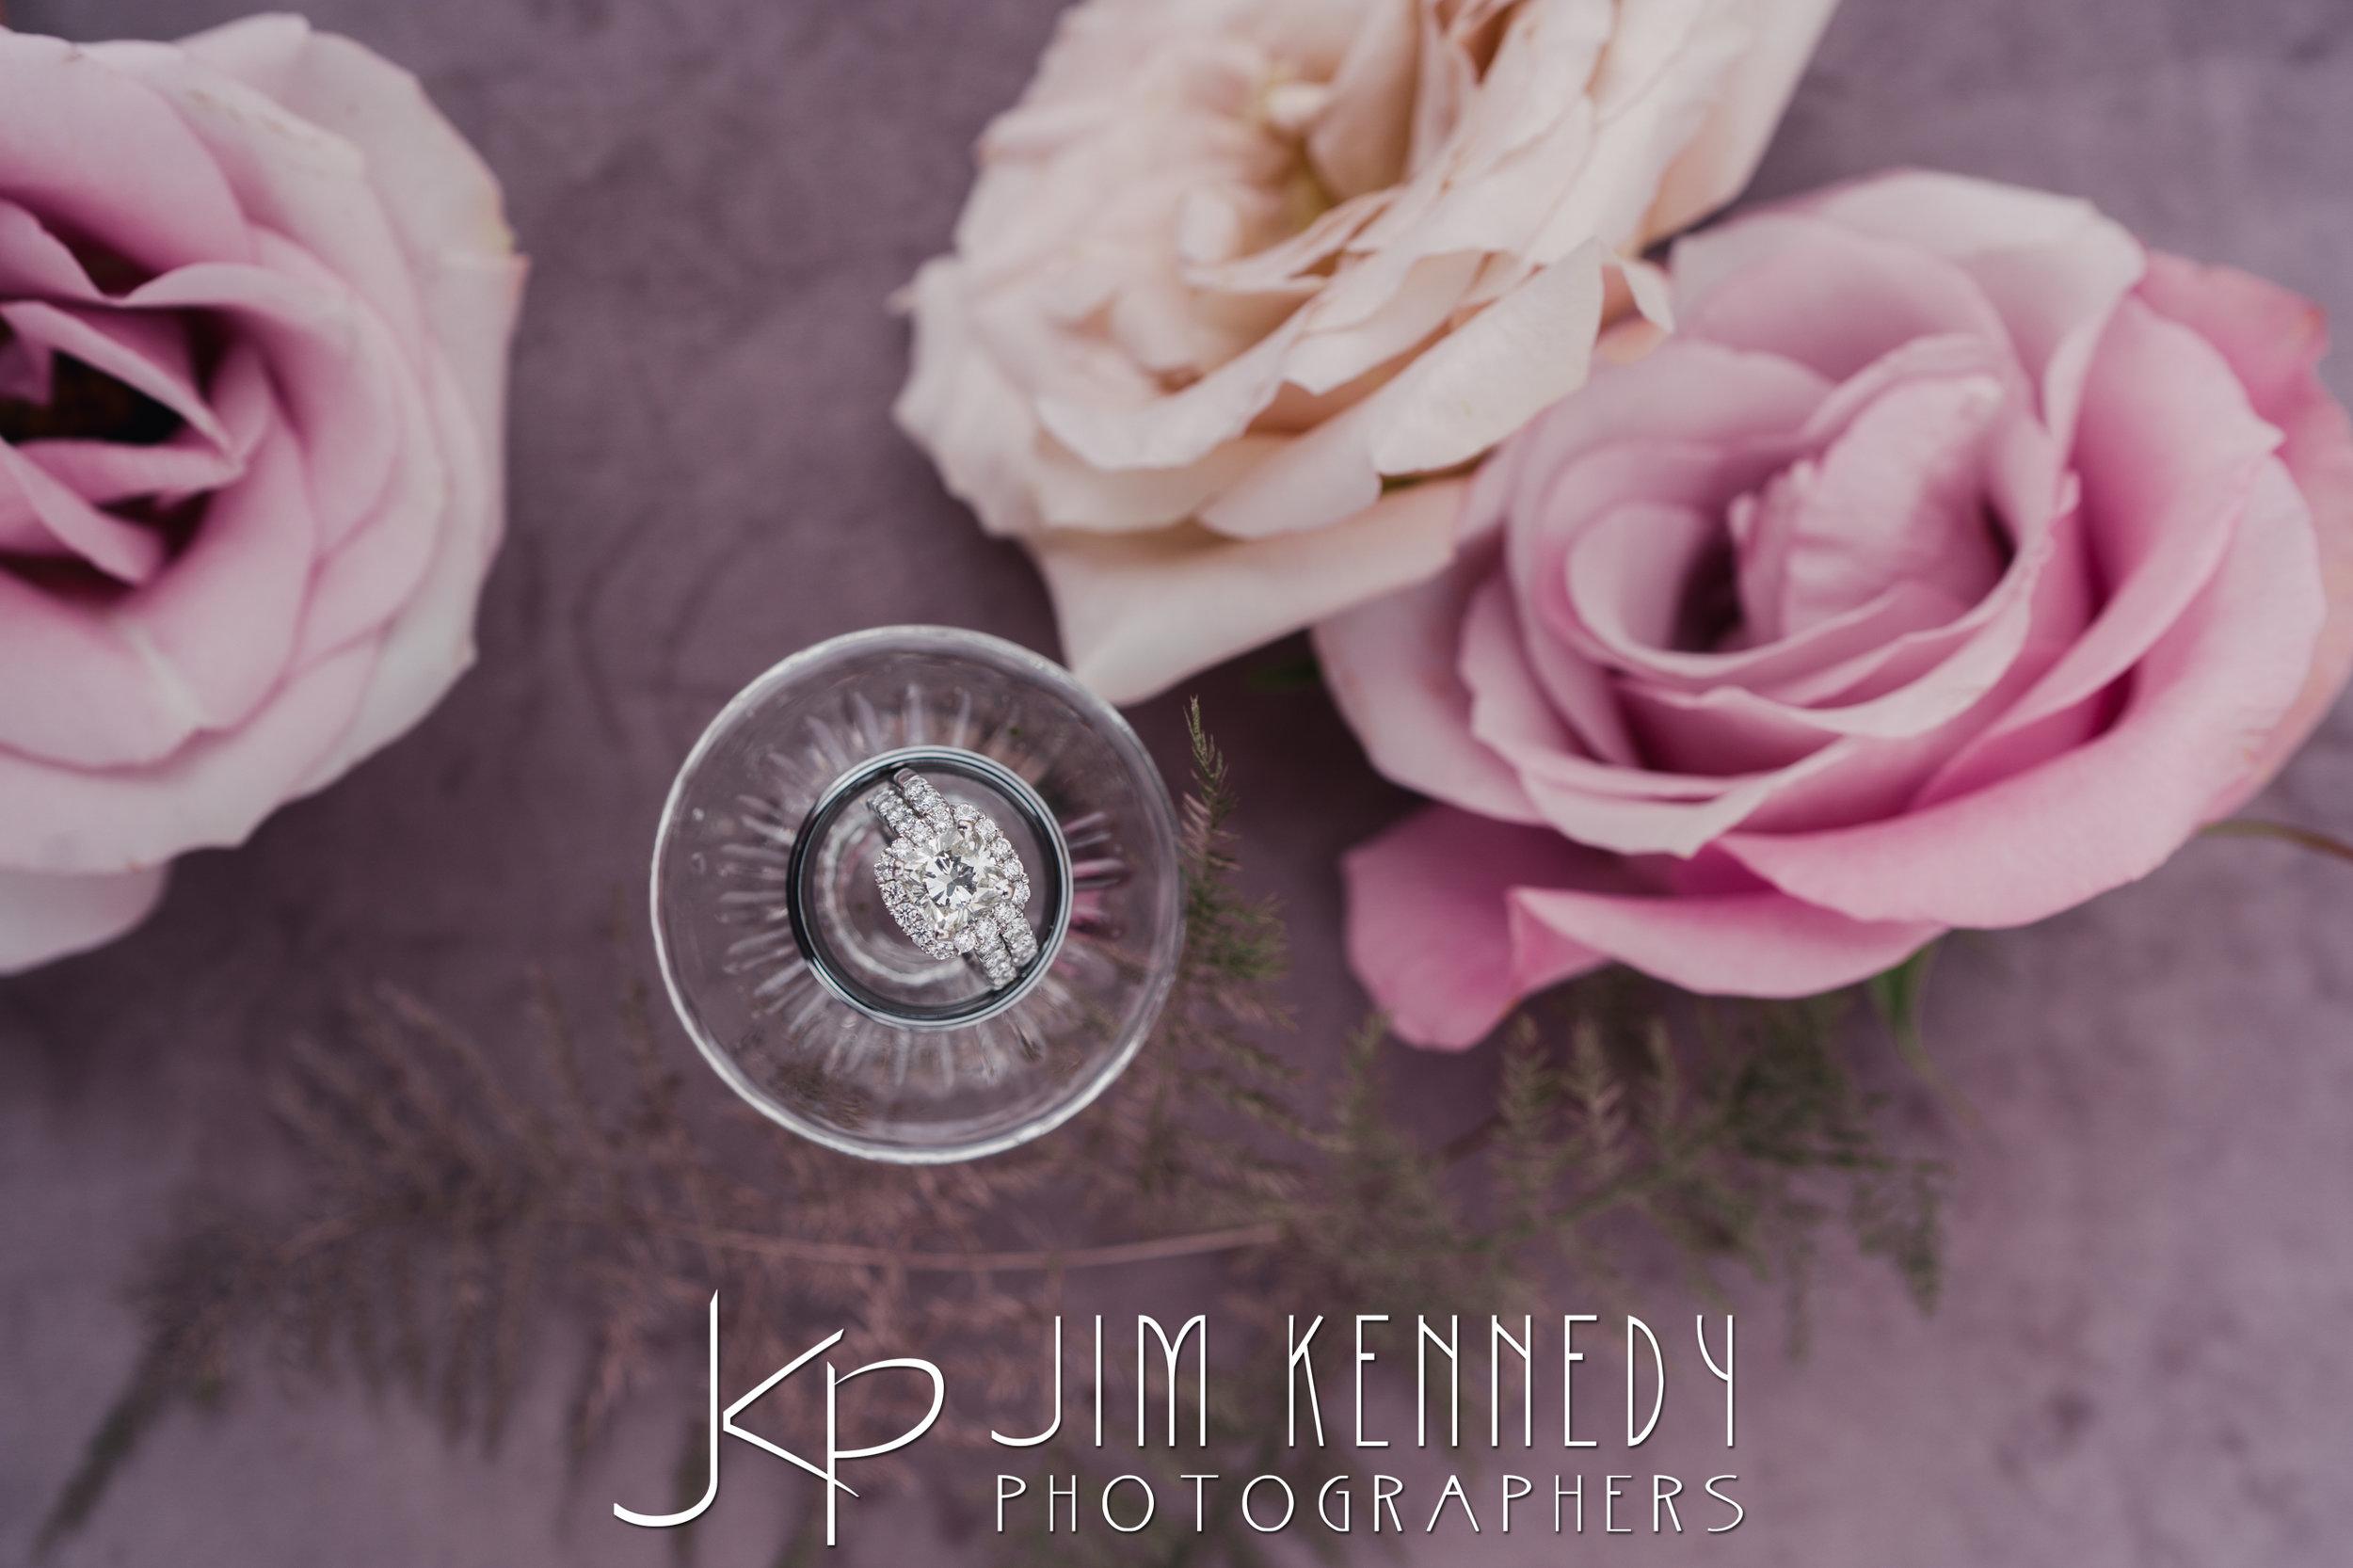 pelican-hill-wedding-jim-kenedy-photographers_0018.JPG